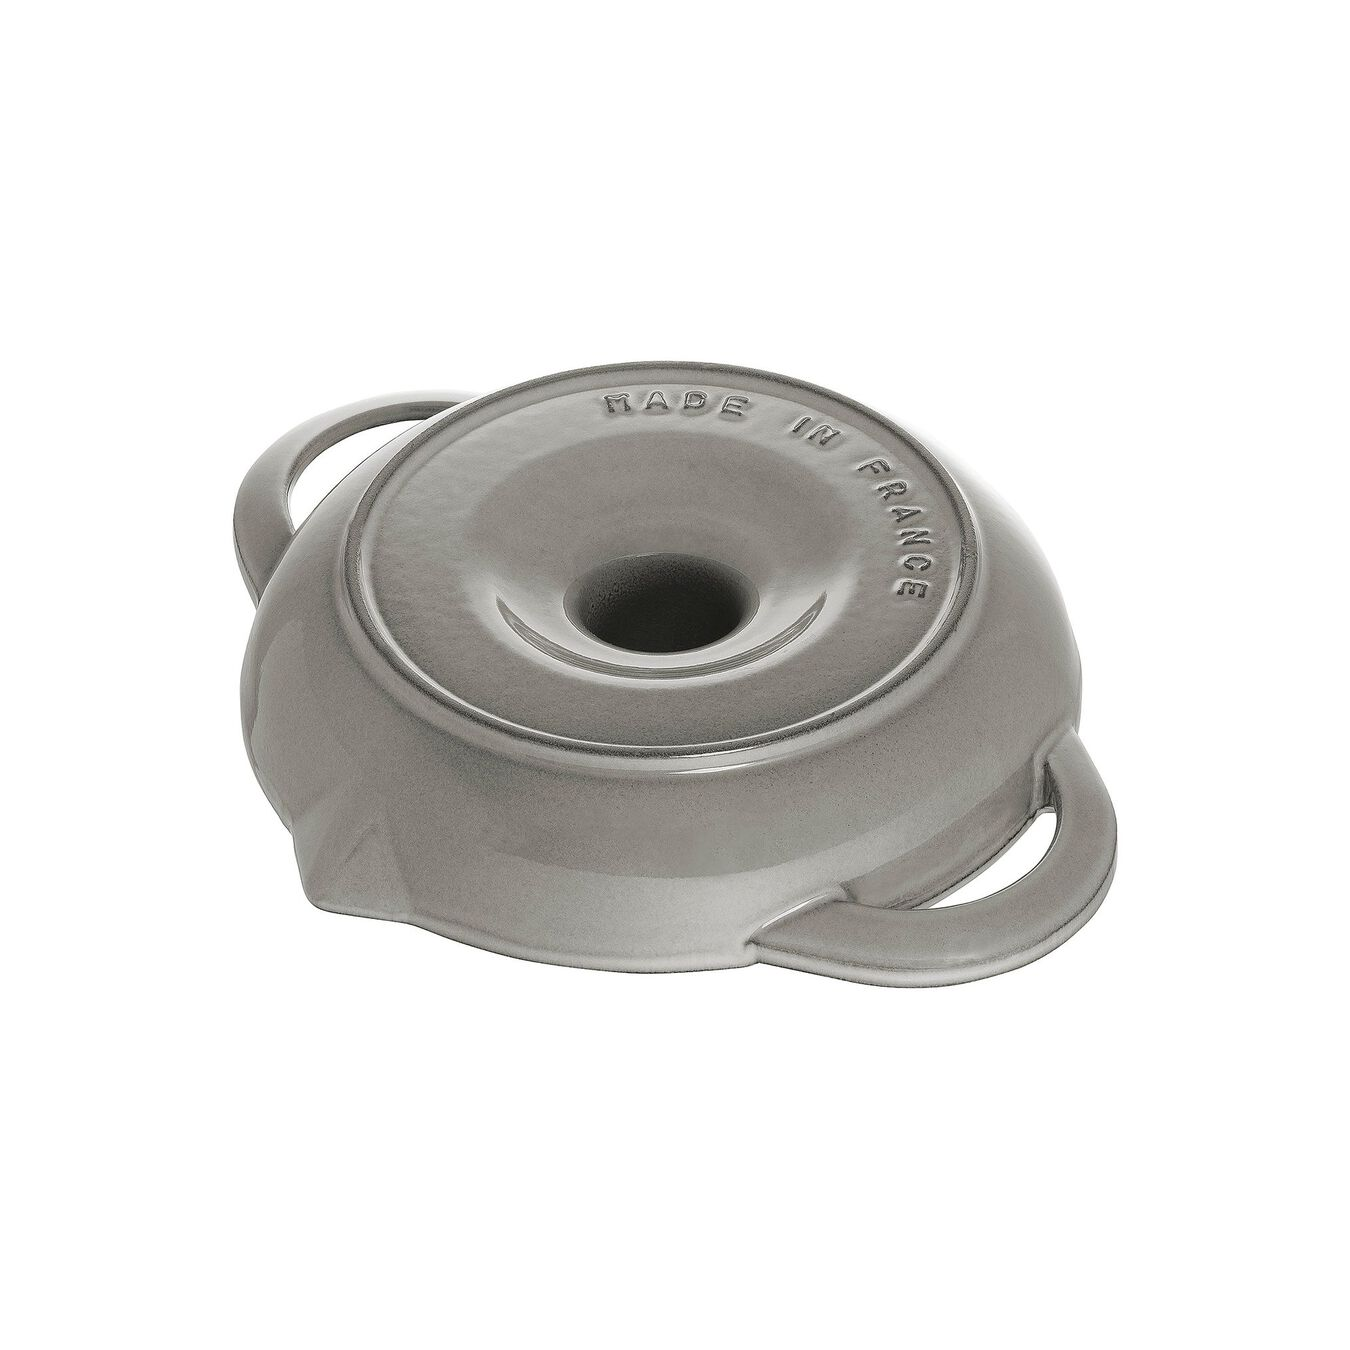 24 cm Cast iron round Rôtissoire, Graphite-Grey,,large 2